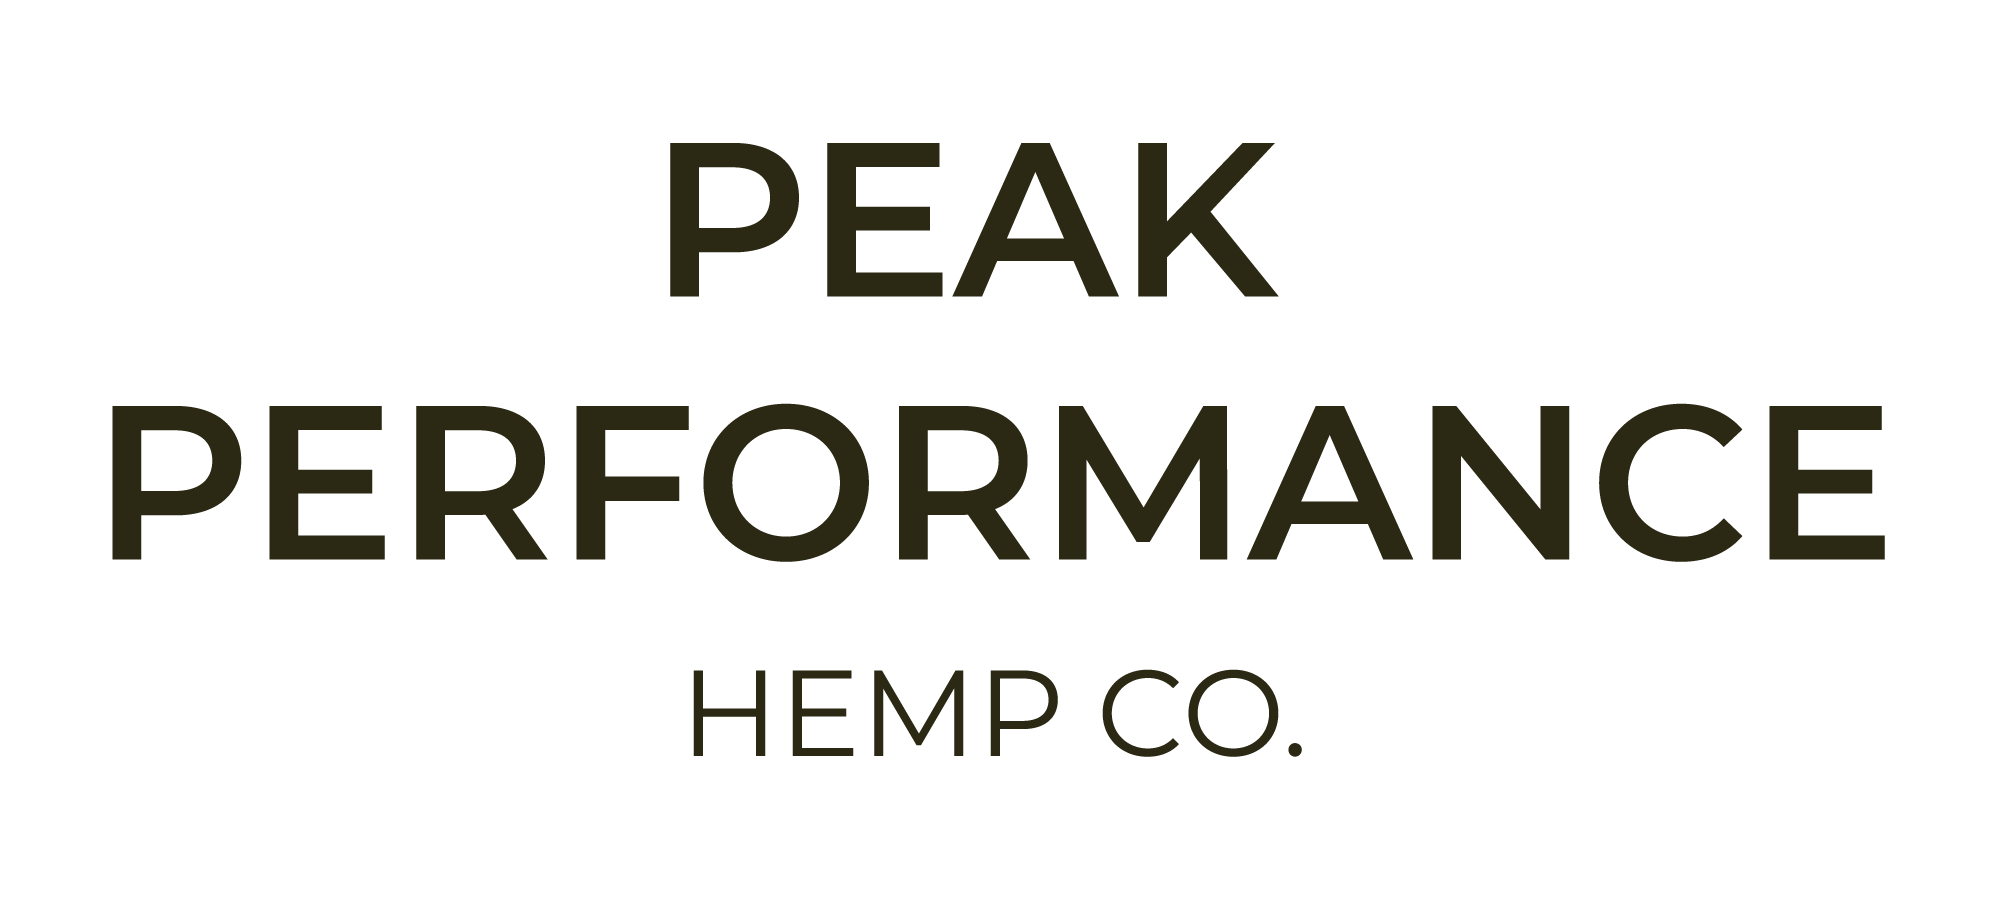 PPH - Alternate Mark (Simple Wordmark) - Full Color.png